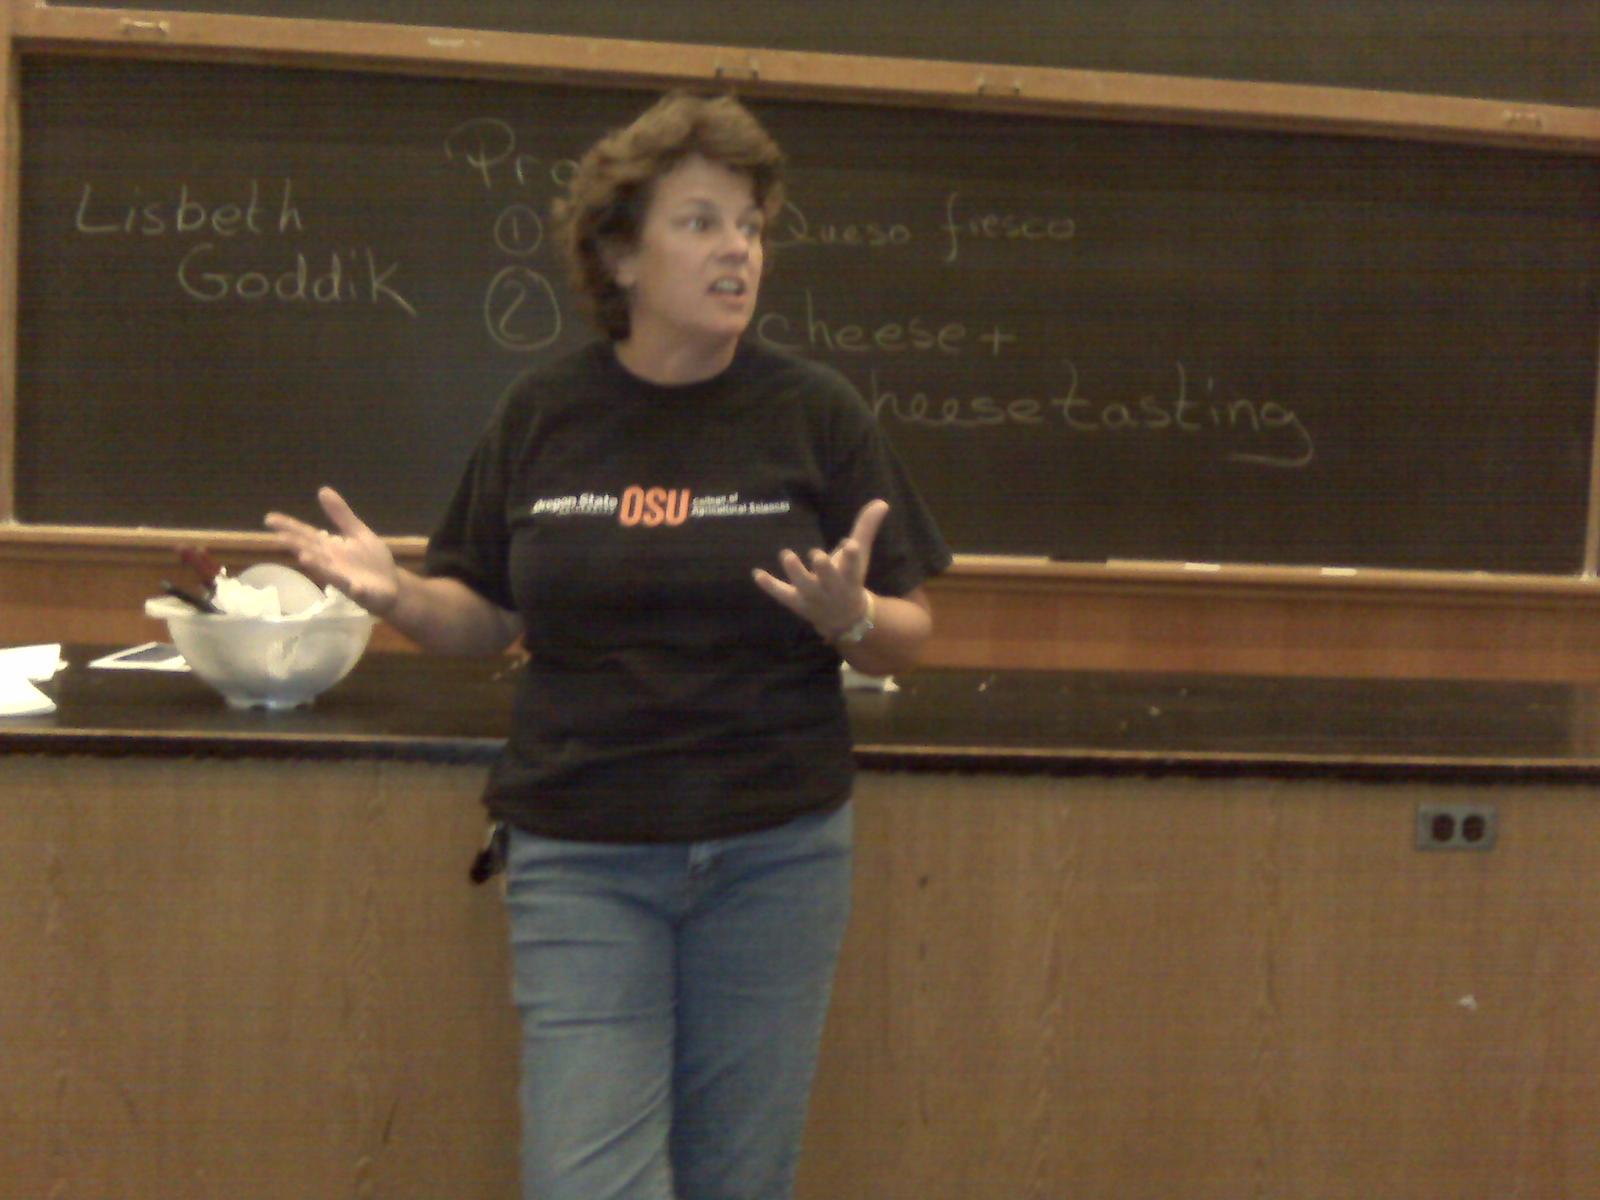 Oregon State University's Dr. Lisbeth Goddik-Meunier taught the seminar.